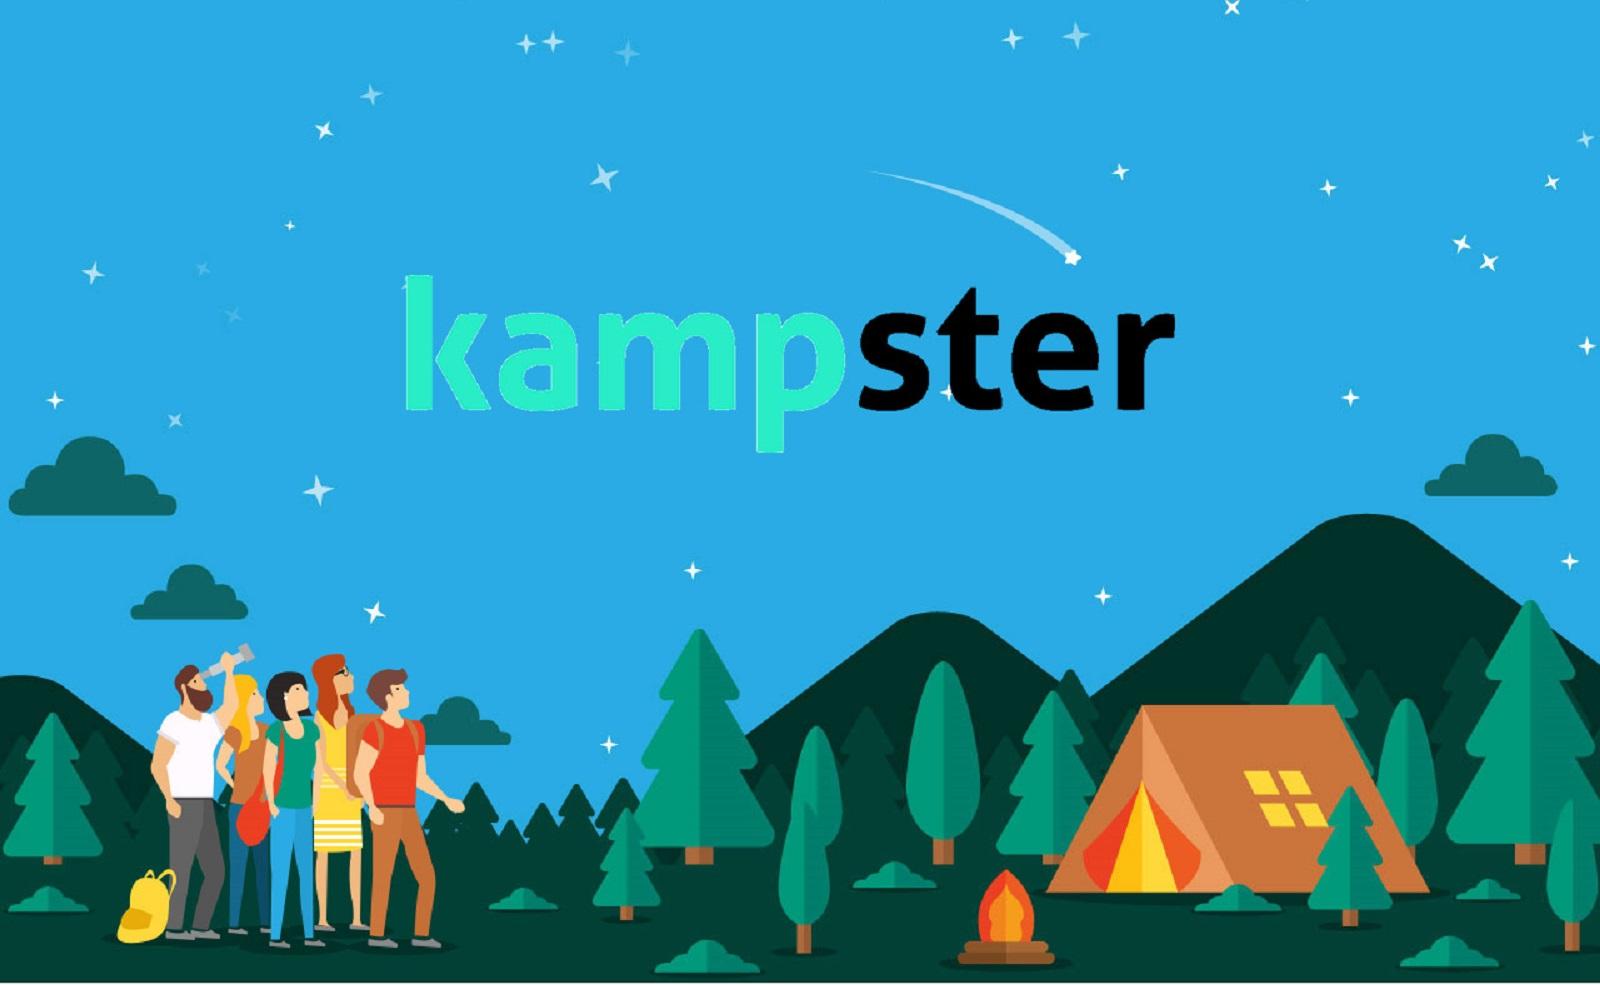 Kampster